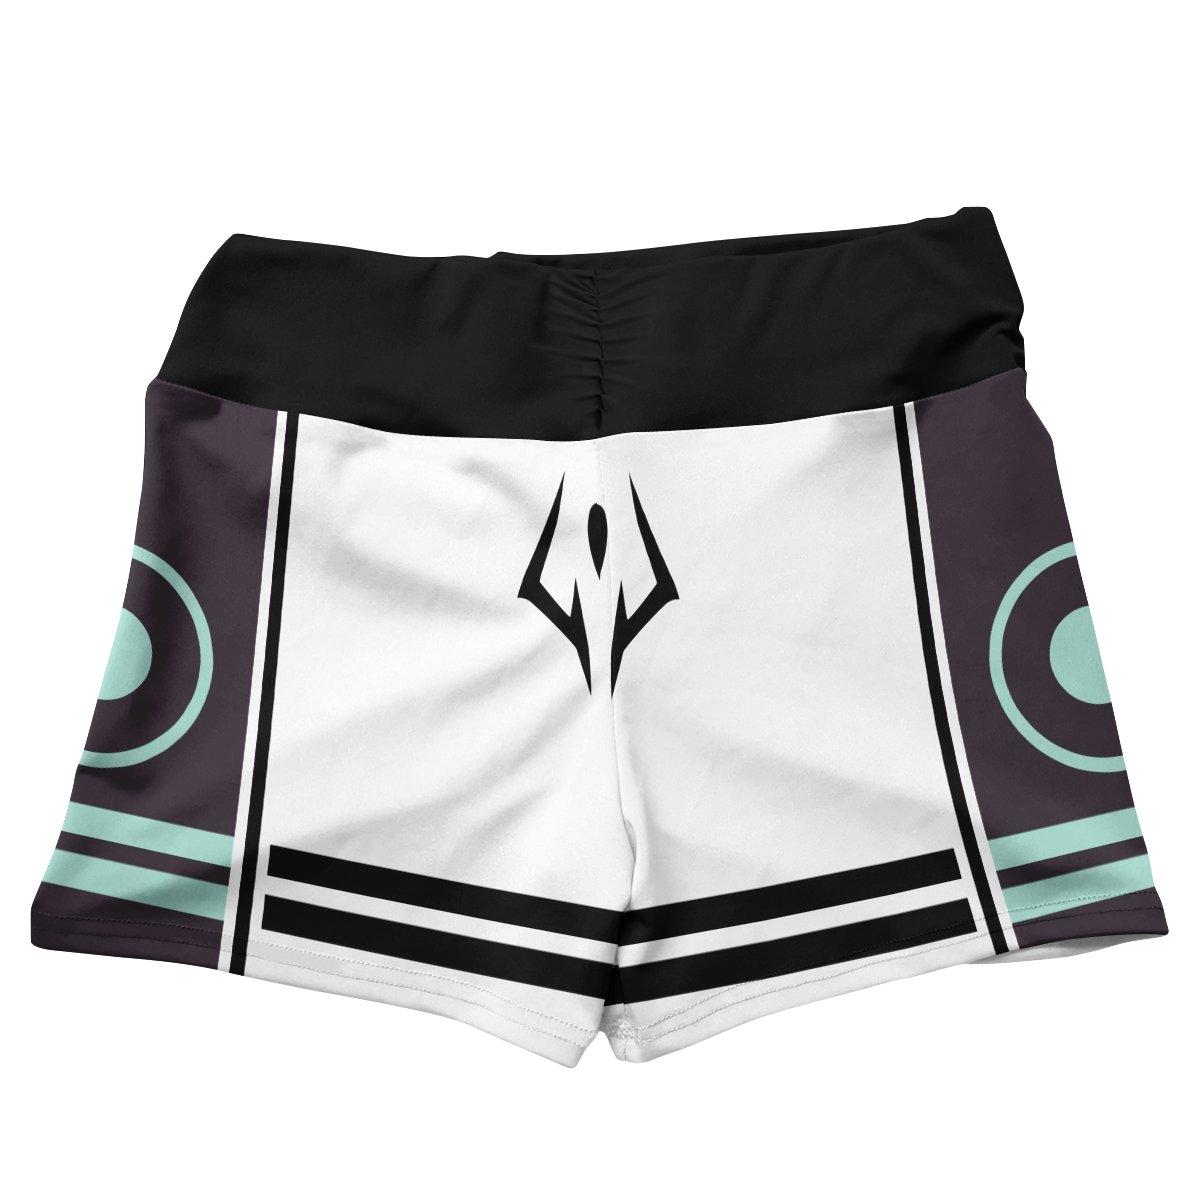 legend sukuna active wear set 813802 - Anime Swimsuits